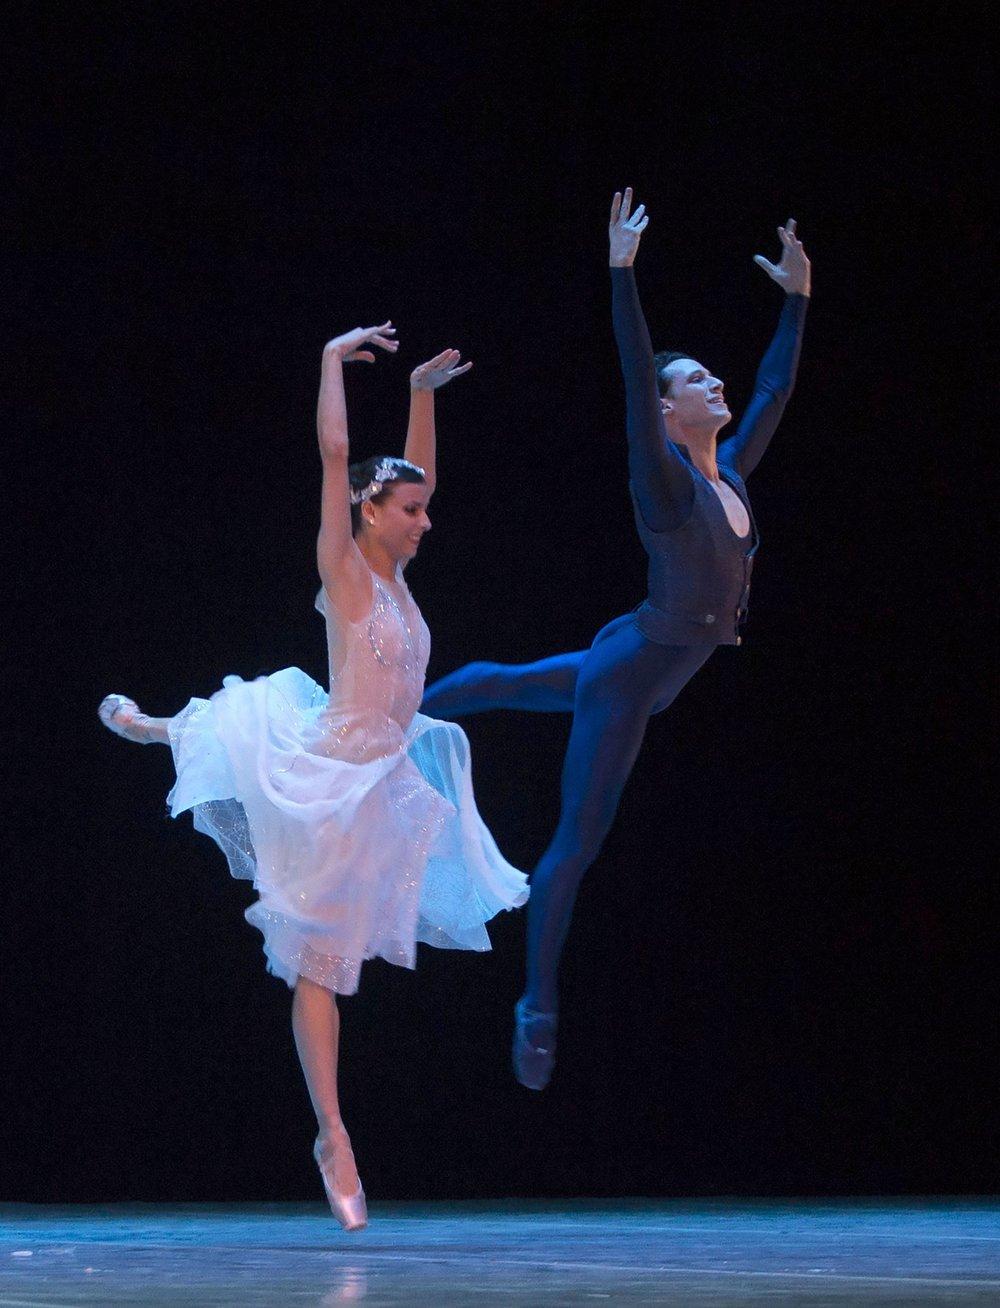 Cuban expatriate ballet dancers Yanela Pinera, left, and Camilo Ramos, currently working at the Queensland Ballet in Australia, perform in Havana, Cuba.